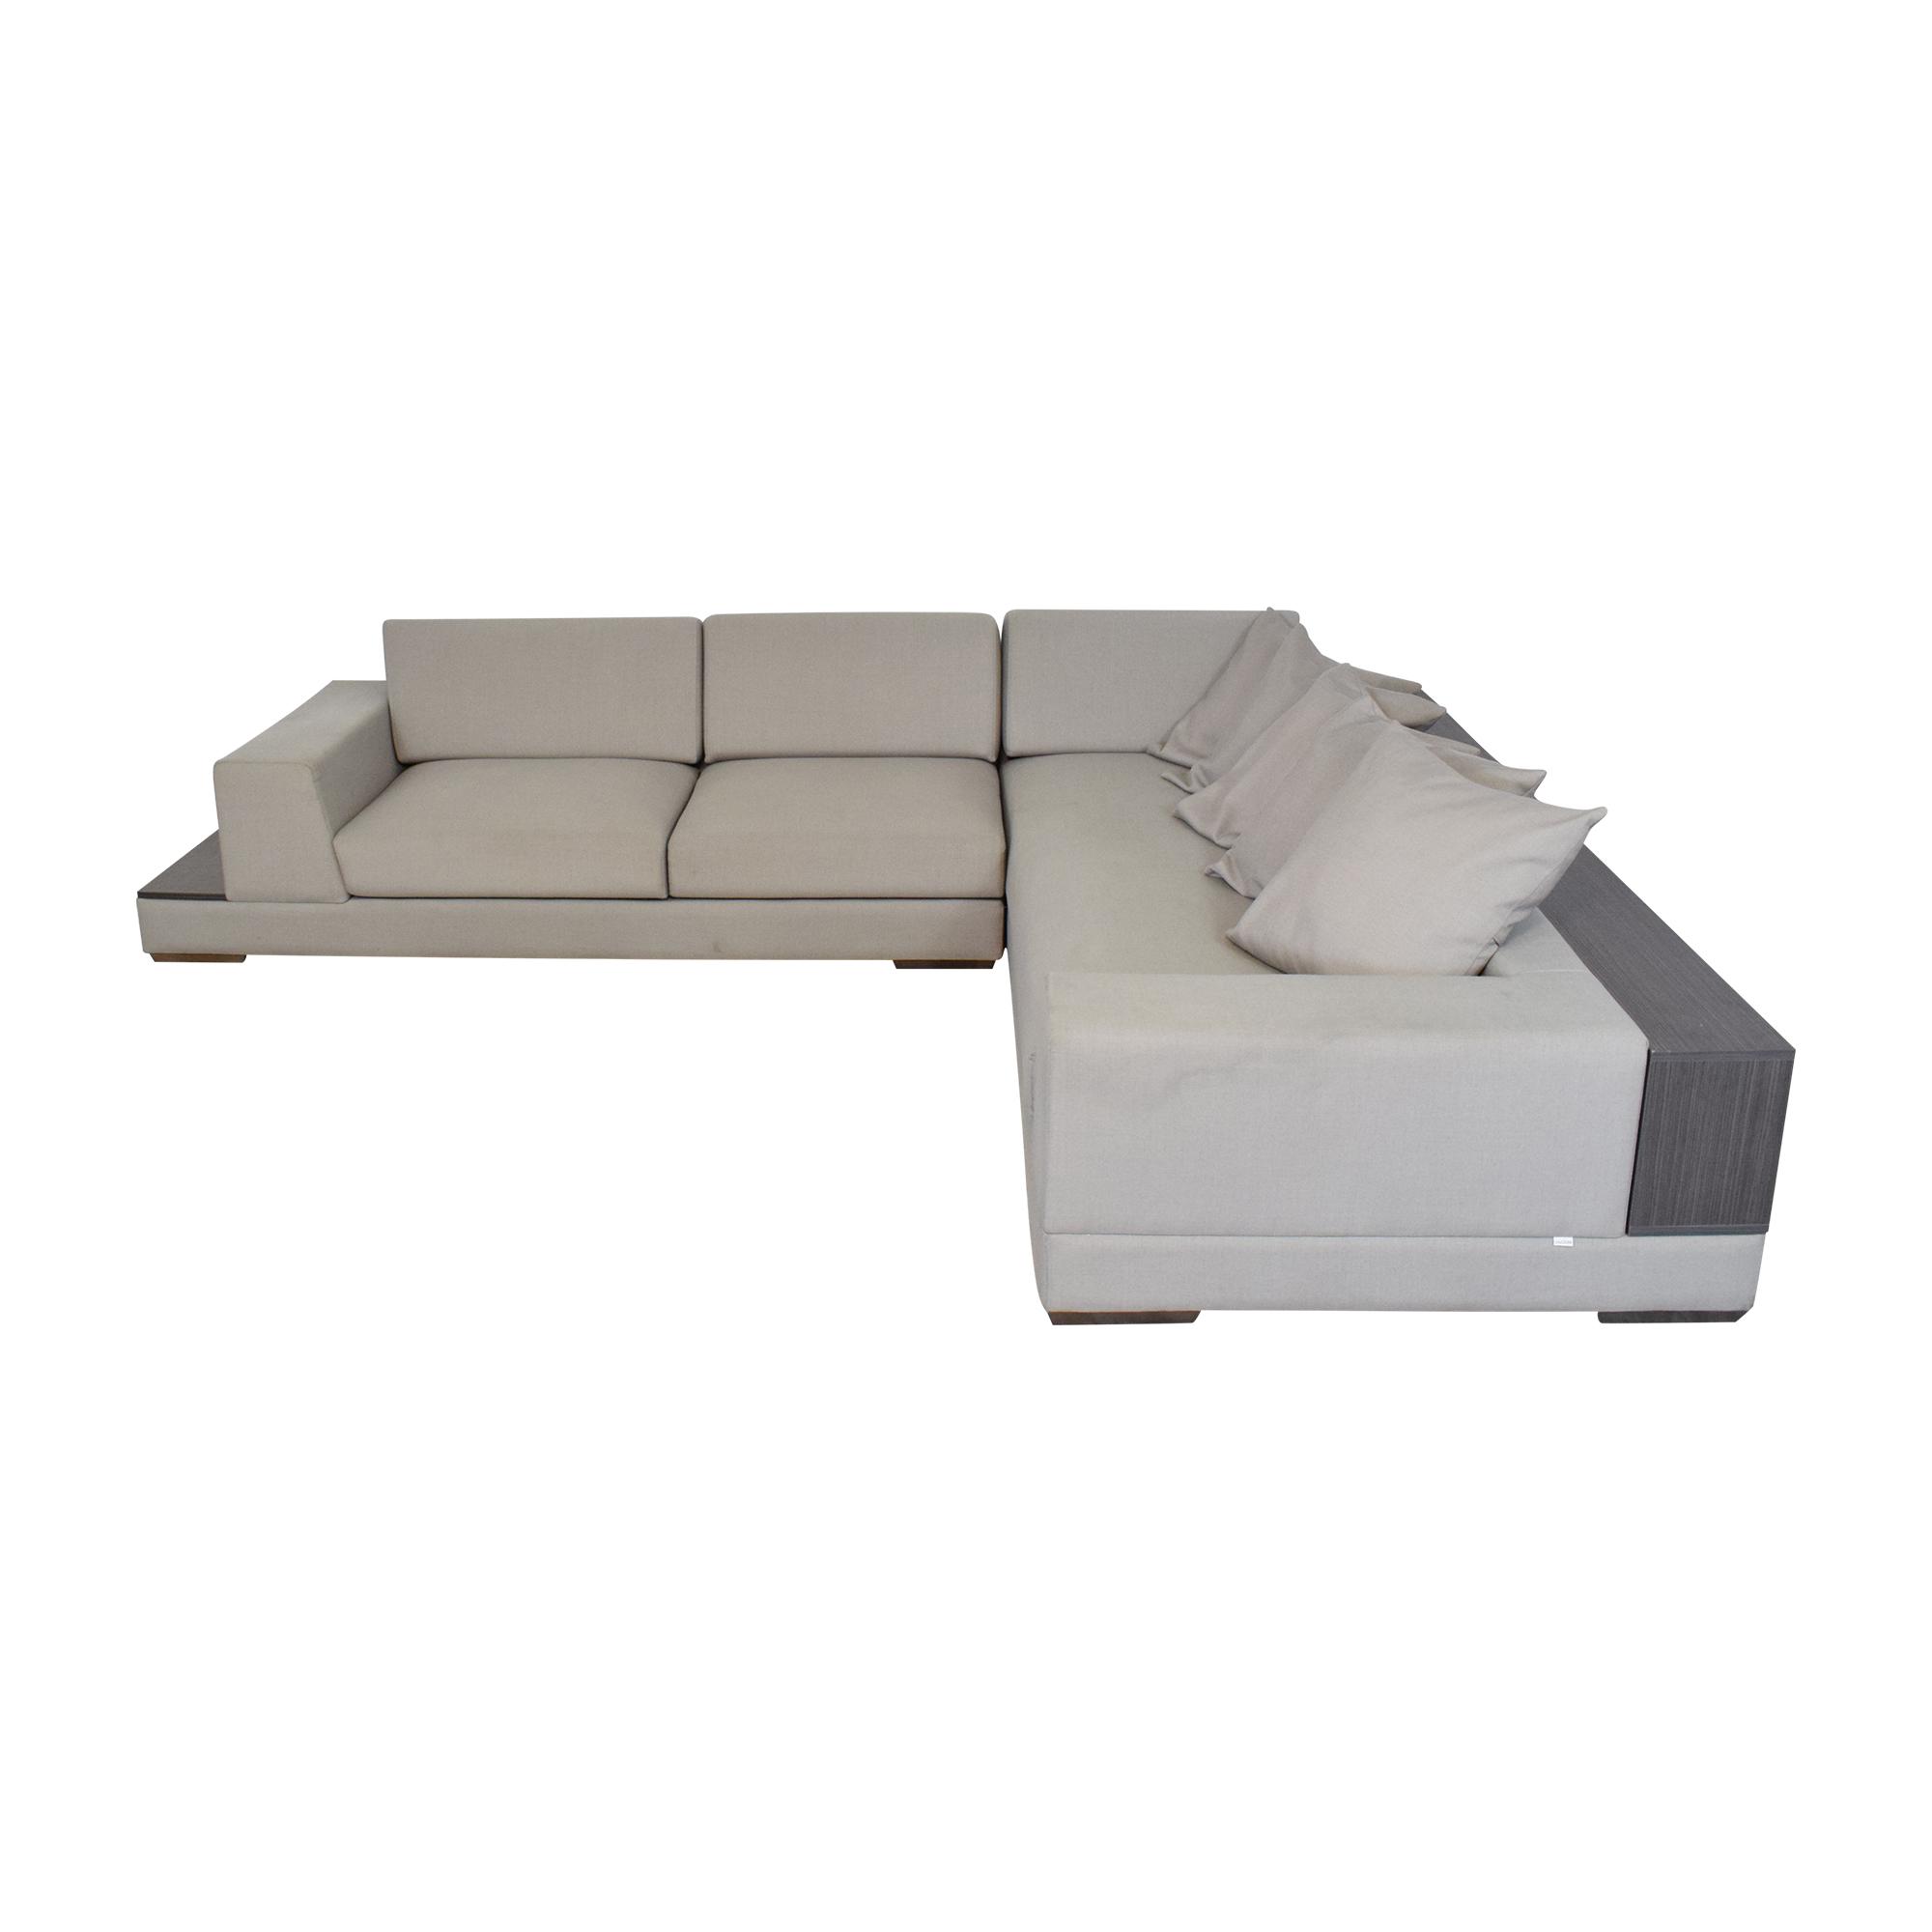 Lazzoni Lazzoni Bikom Modular Sectional Sofa nyc